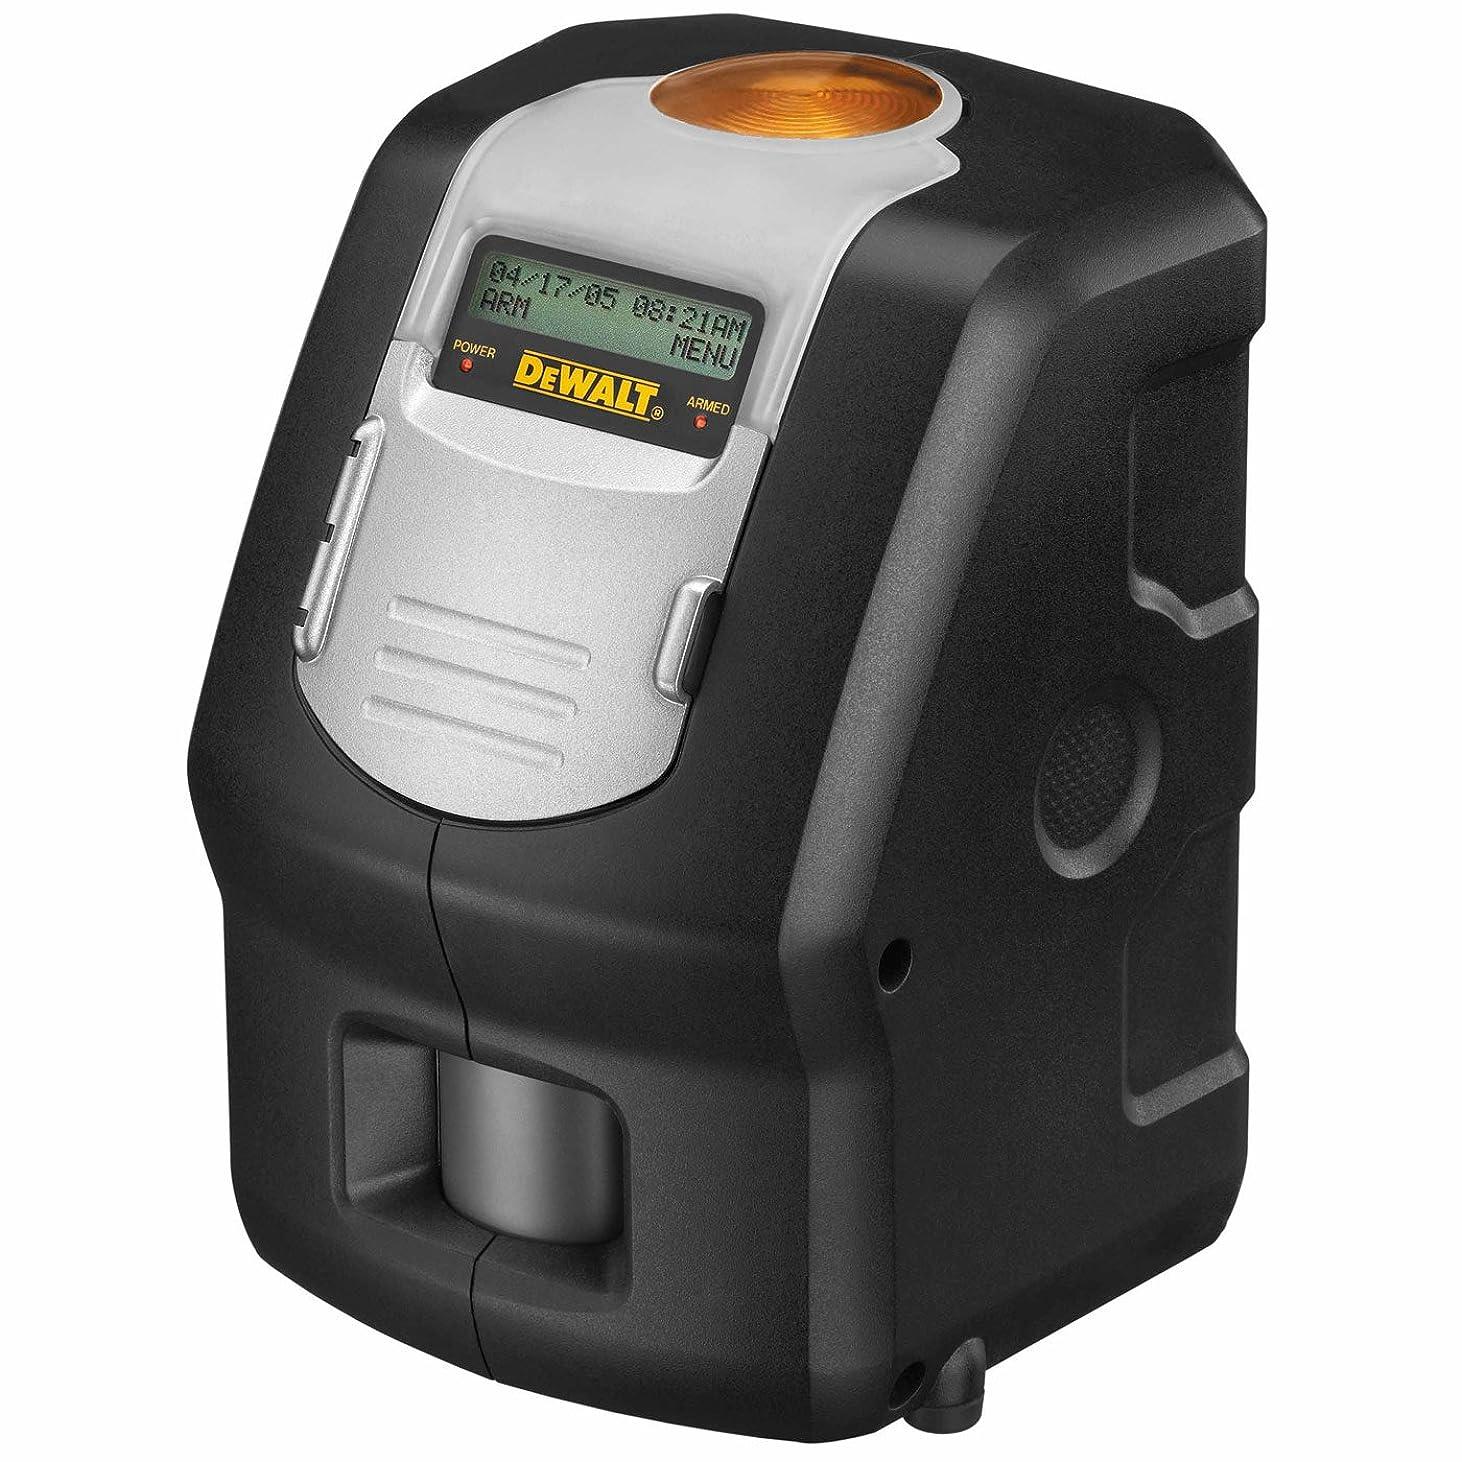 DeWalt DS100 Site Lock Jobsite Security Portable Alarm System (Base Unit) whdfc704018